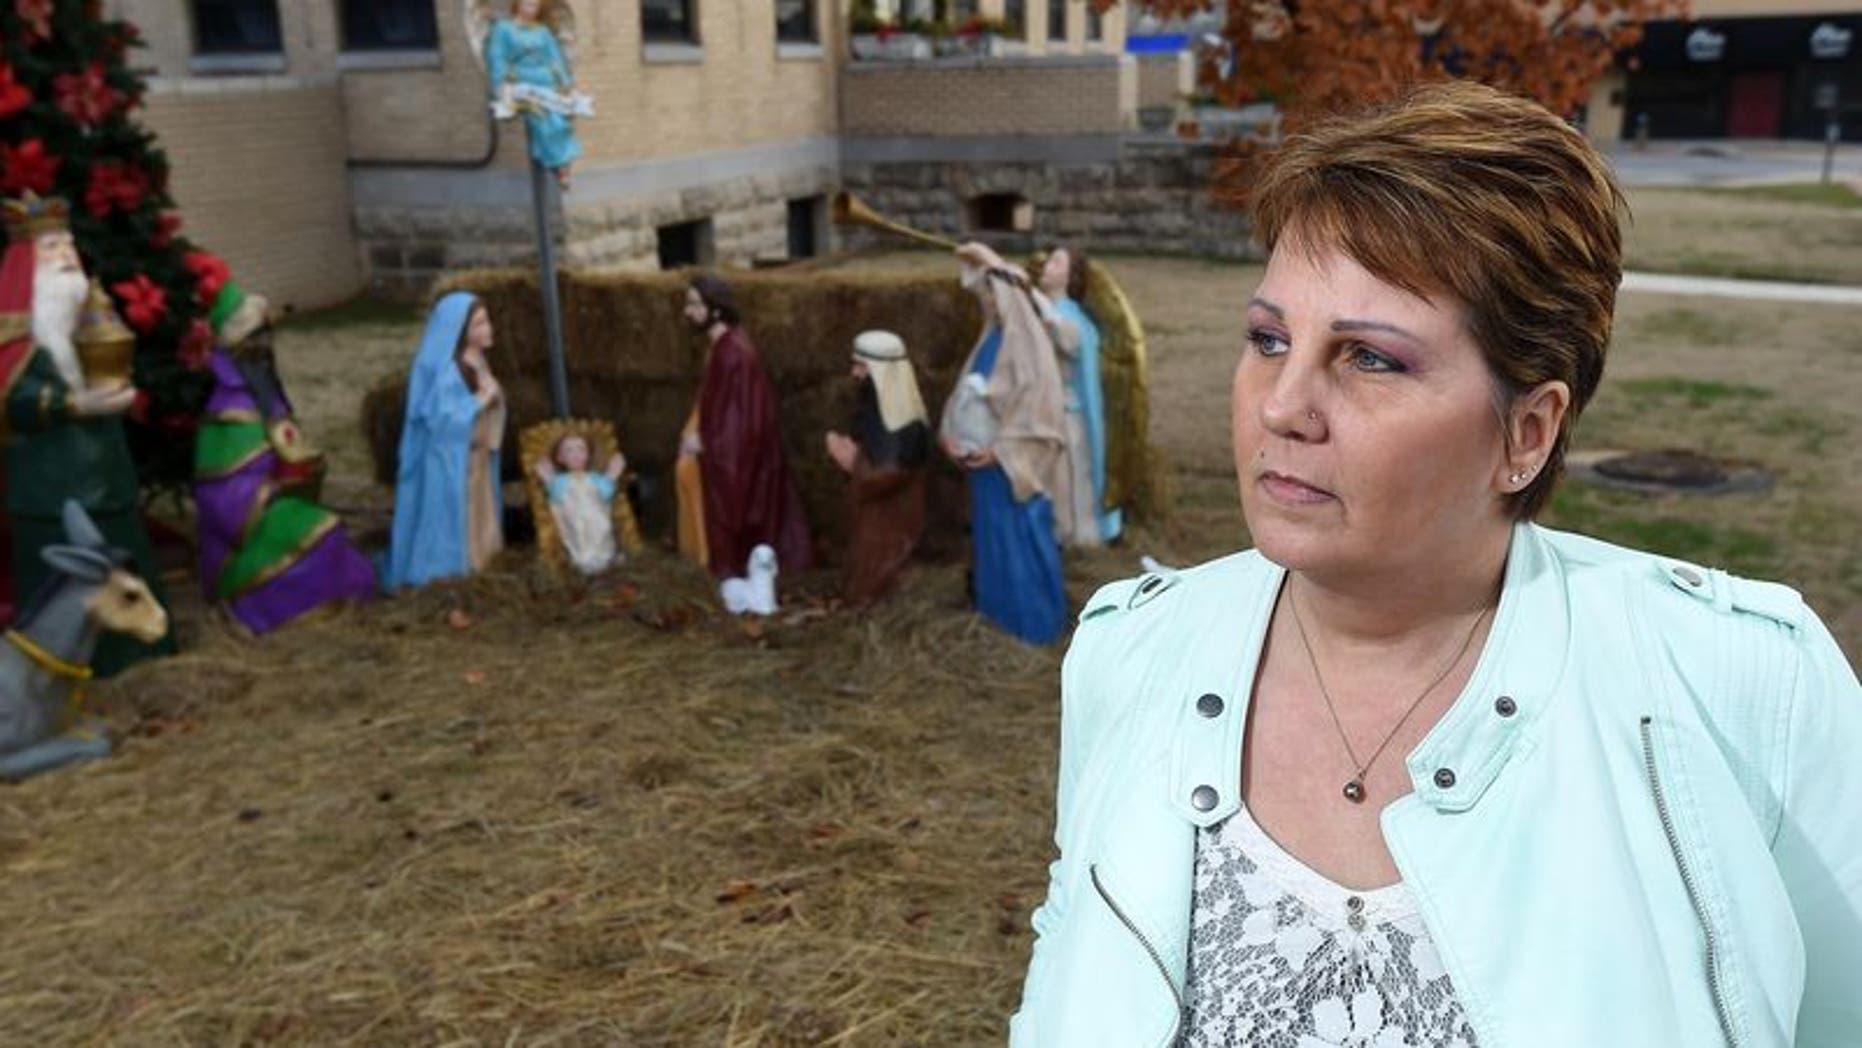 Dessa Blackthorn next to the Nativity scene in 2014.